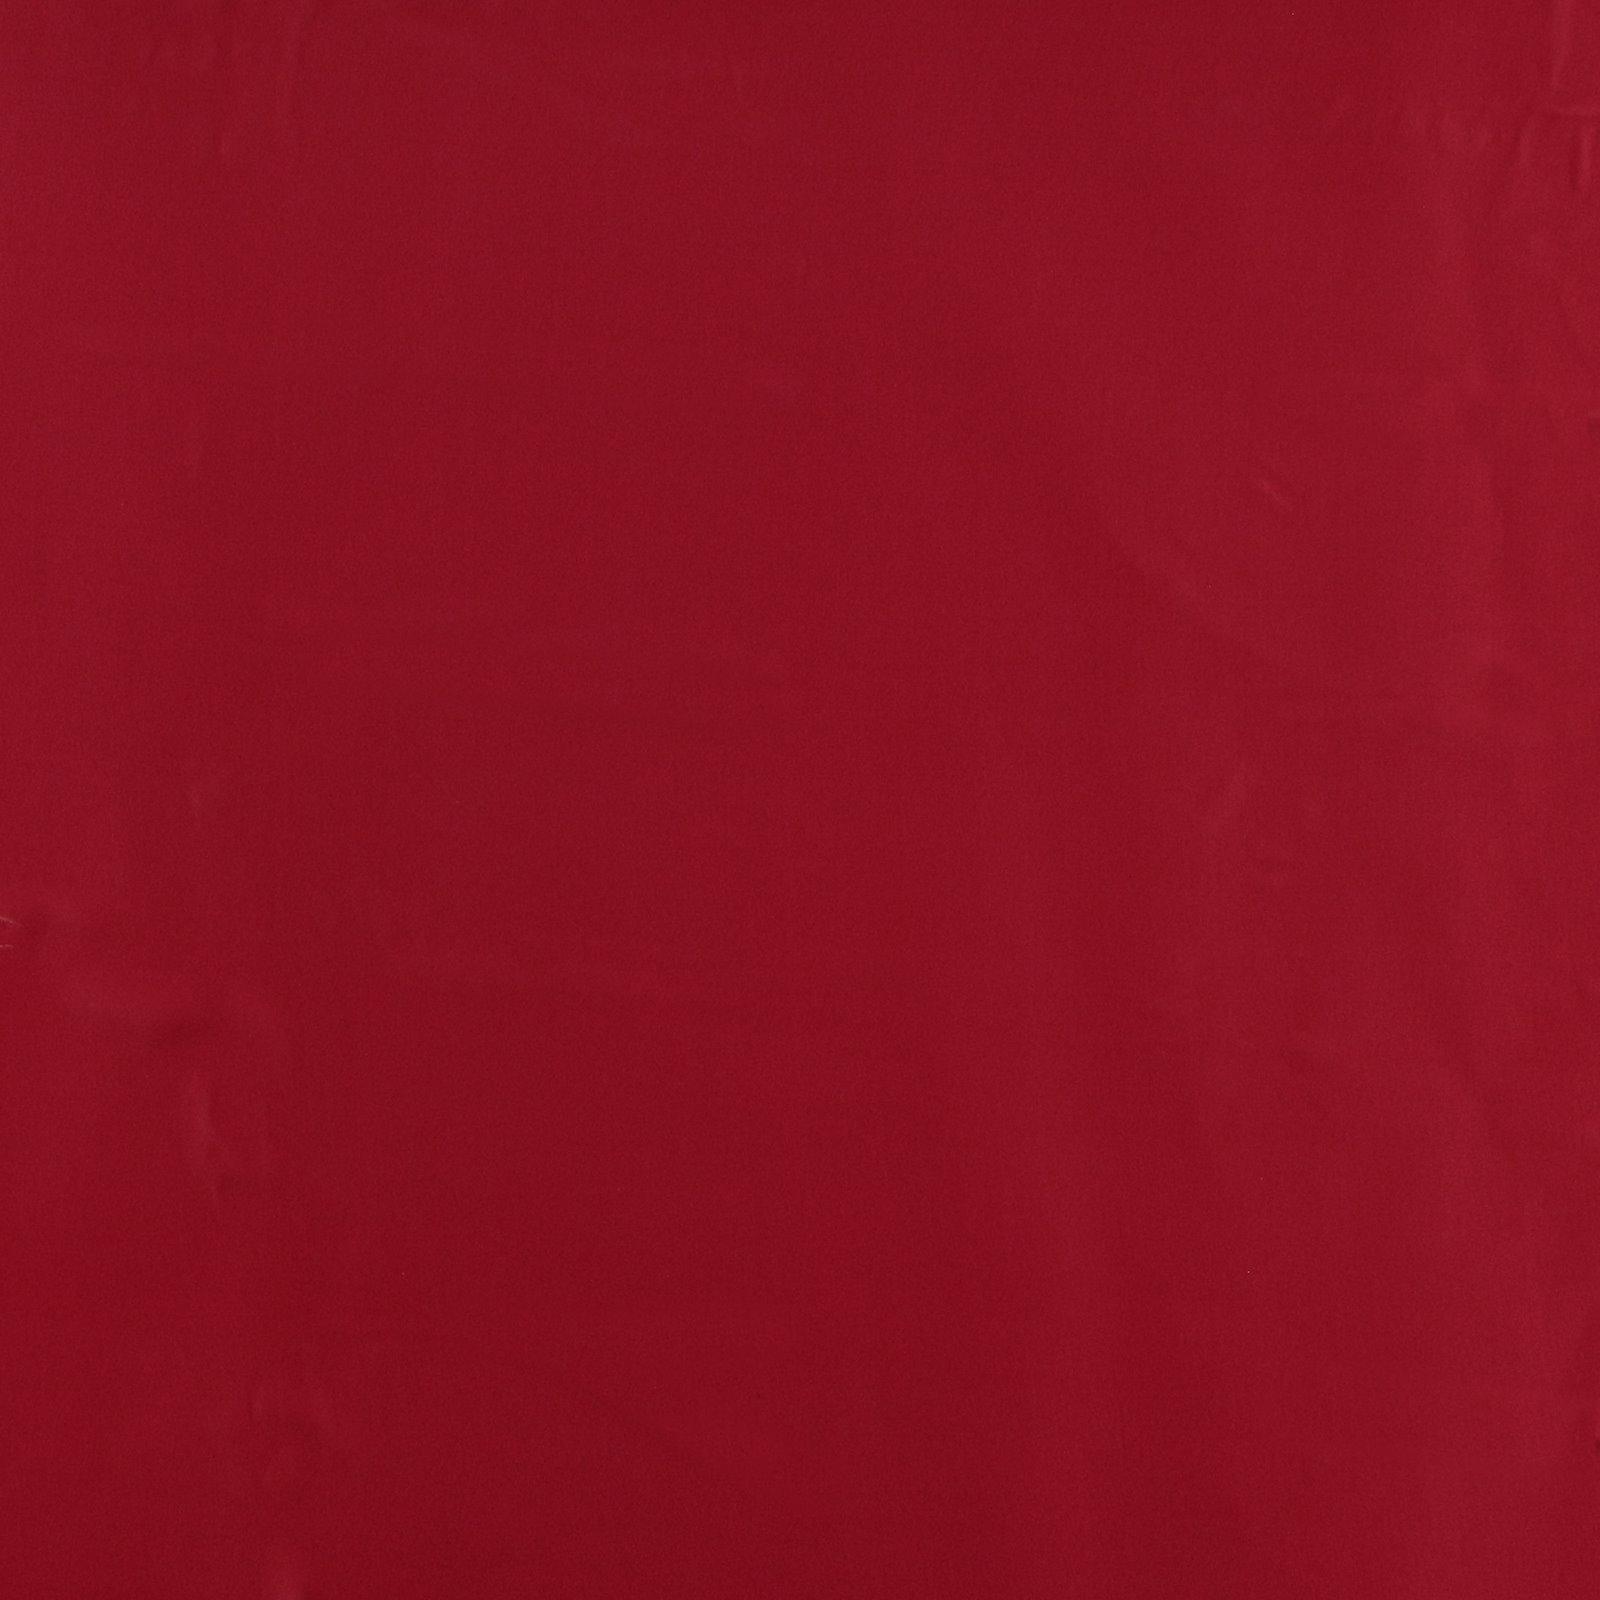 Chiffon dark red 631076_pack_solid